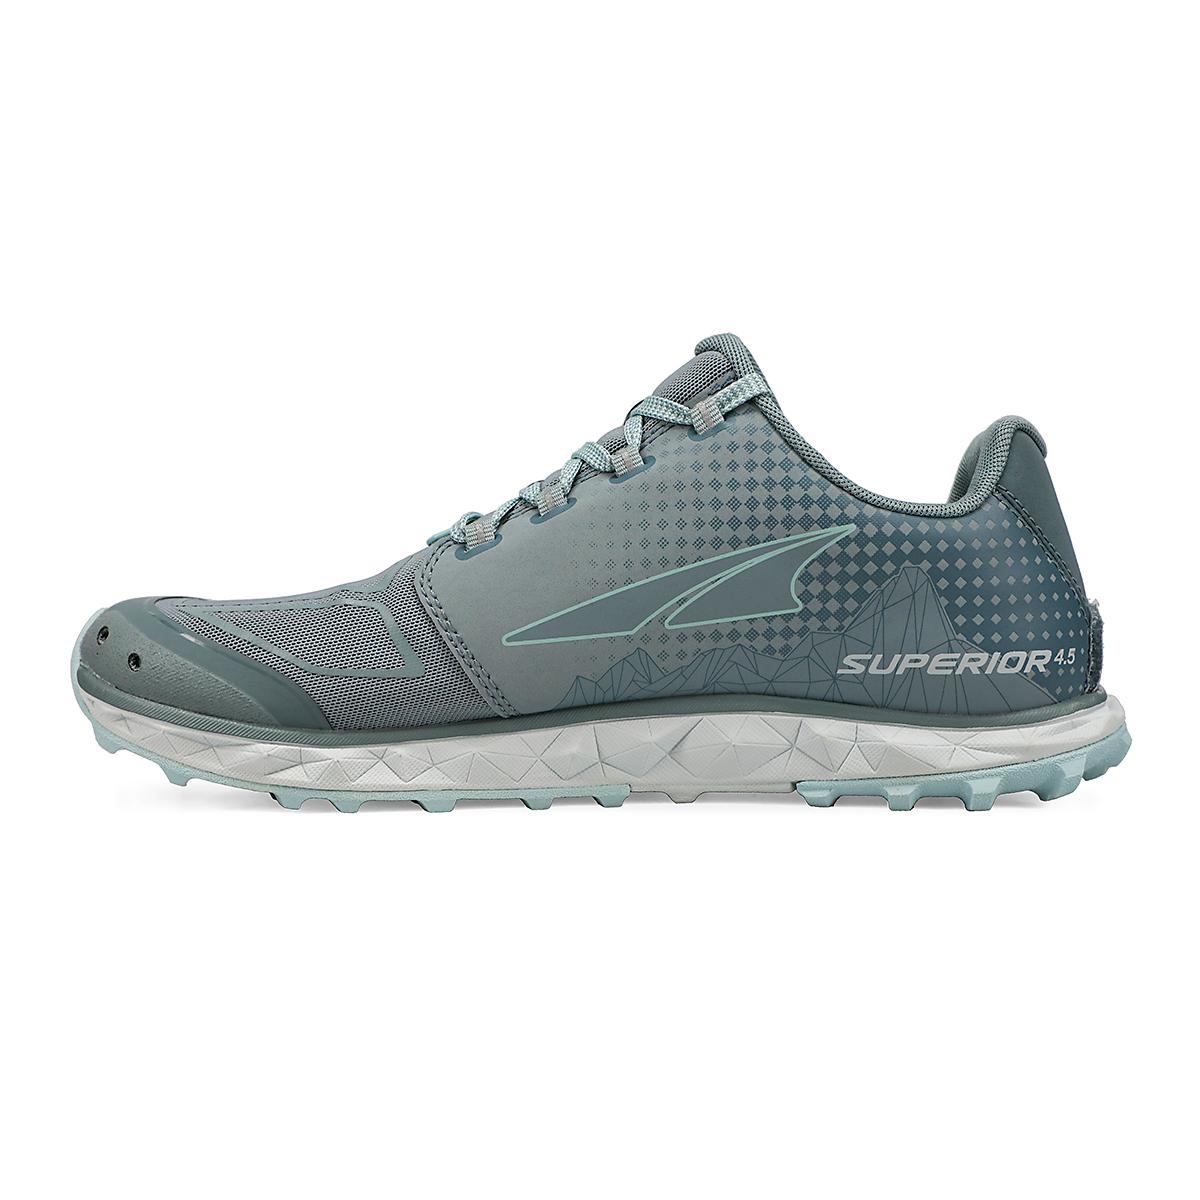 Women's Altra Superior 4.5 Trail Running Shoe - Color: Light Blue - Size: 5.5 - Width: Regular, Light Blue, large, image 2